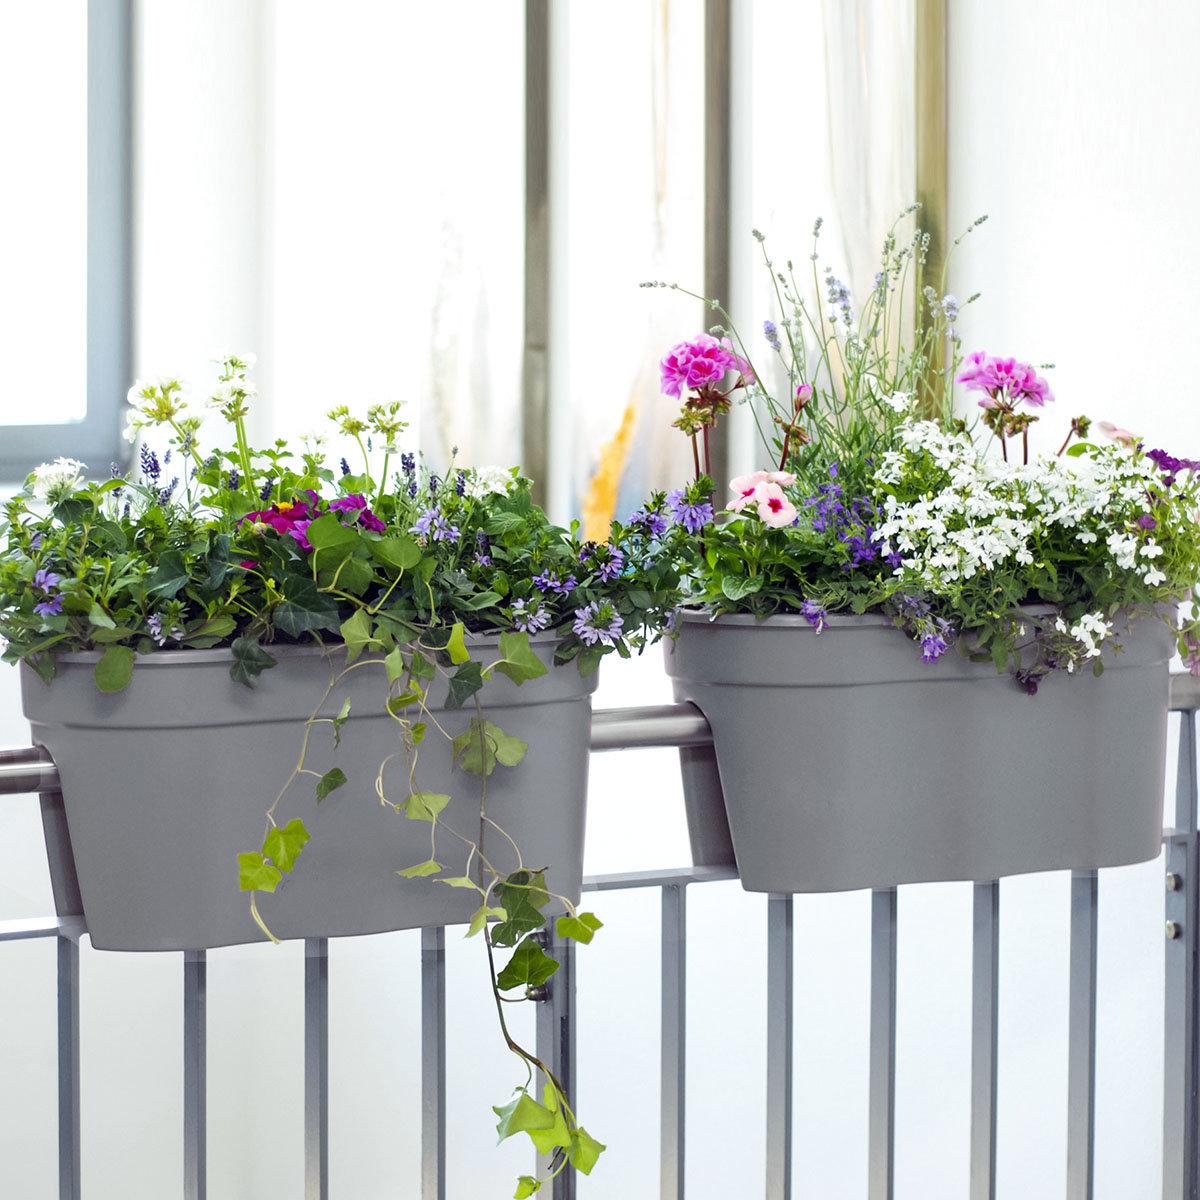 Geländertopf Flowerclip, 57,5 x 27,7 x 27 cm, grau | #2